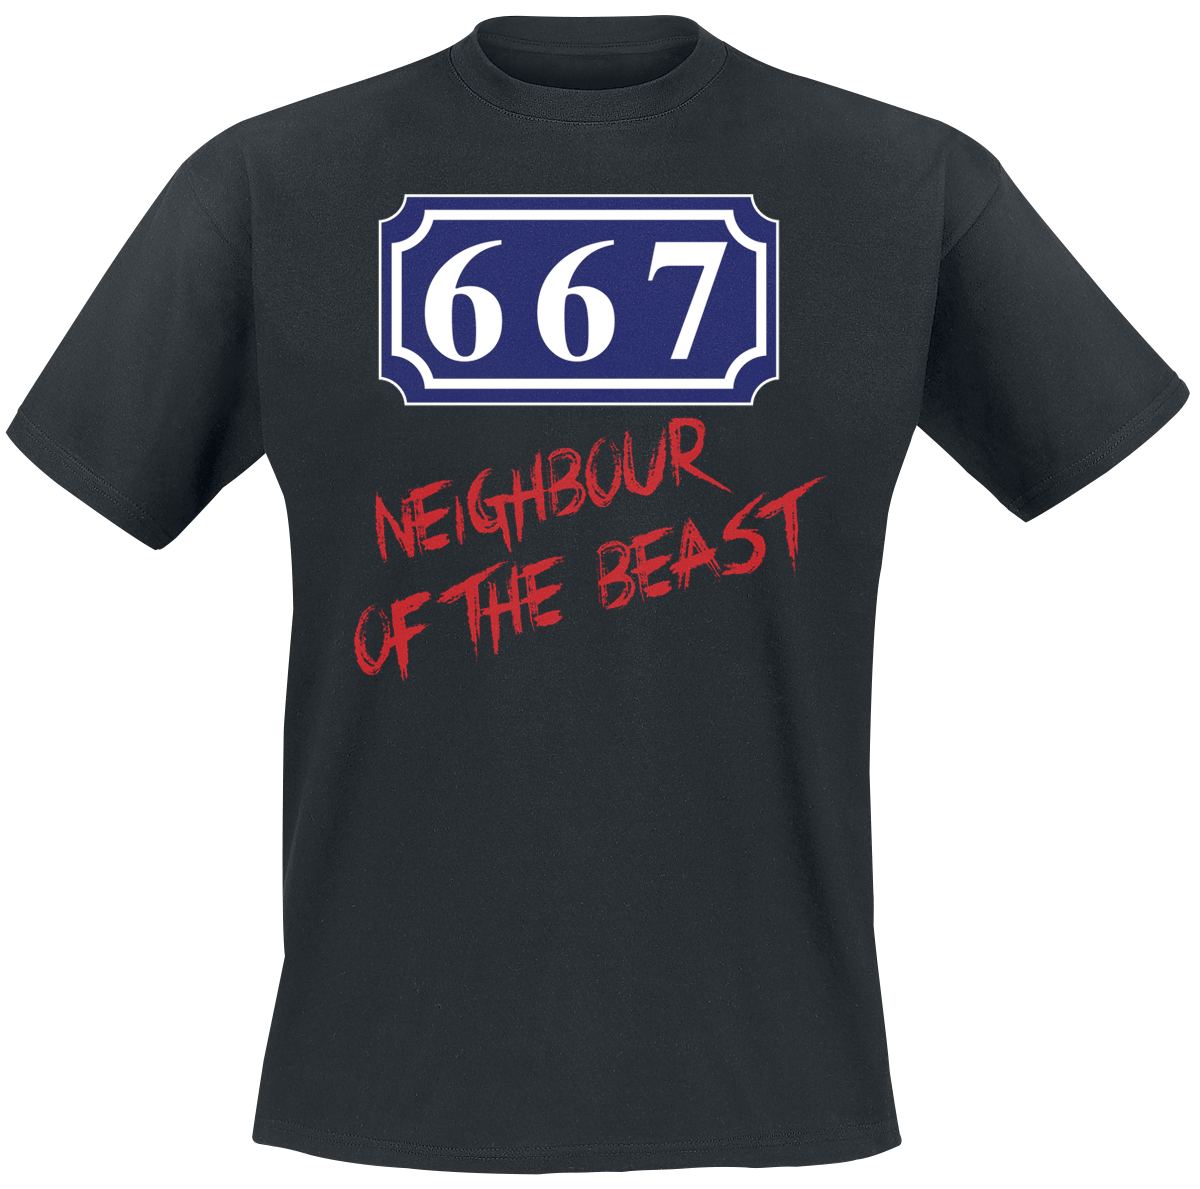 667 Neighbour Of The Beast - - T-Shirt - black